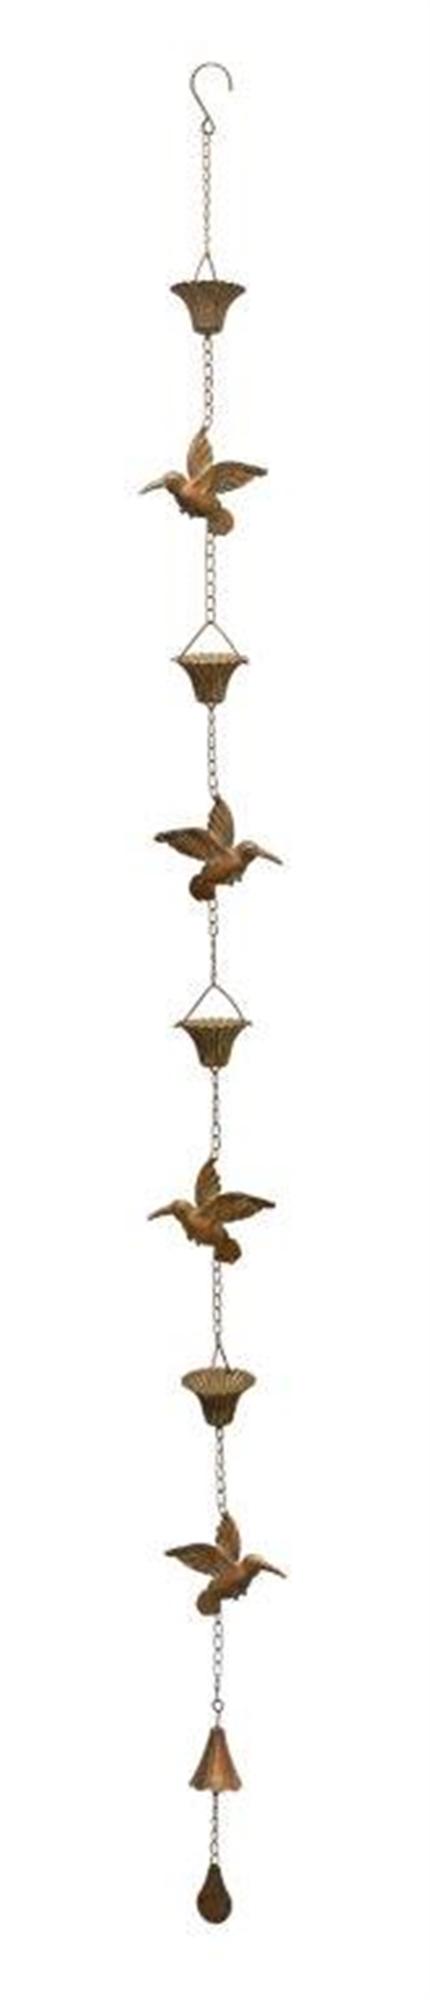 "Hummingbird Rain Chain 69""L Iron"